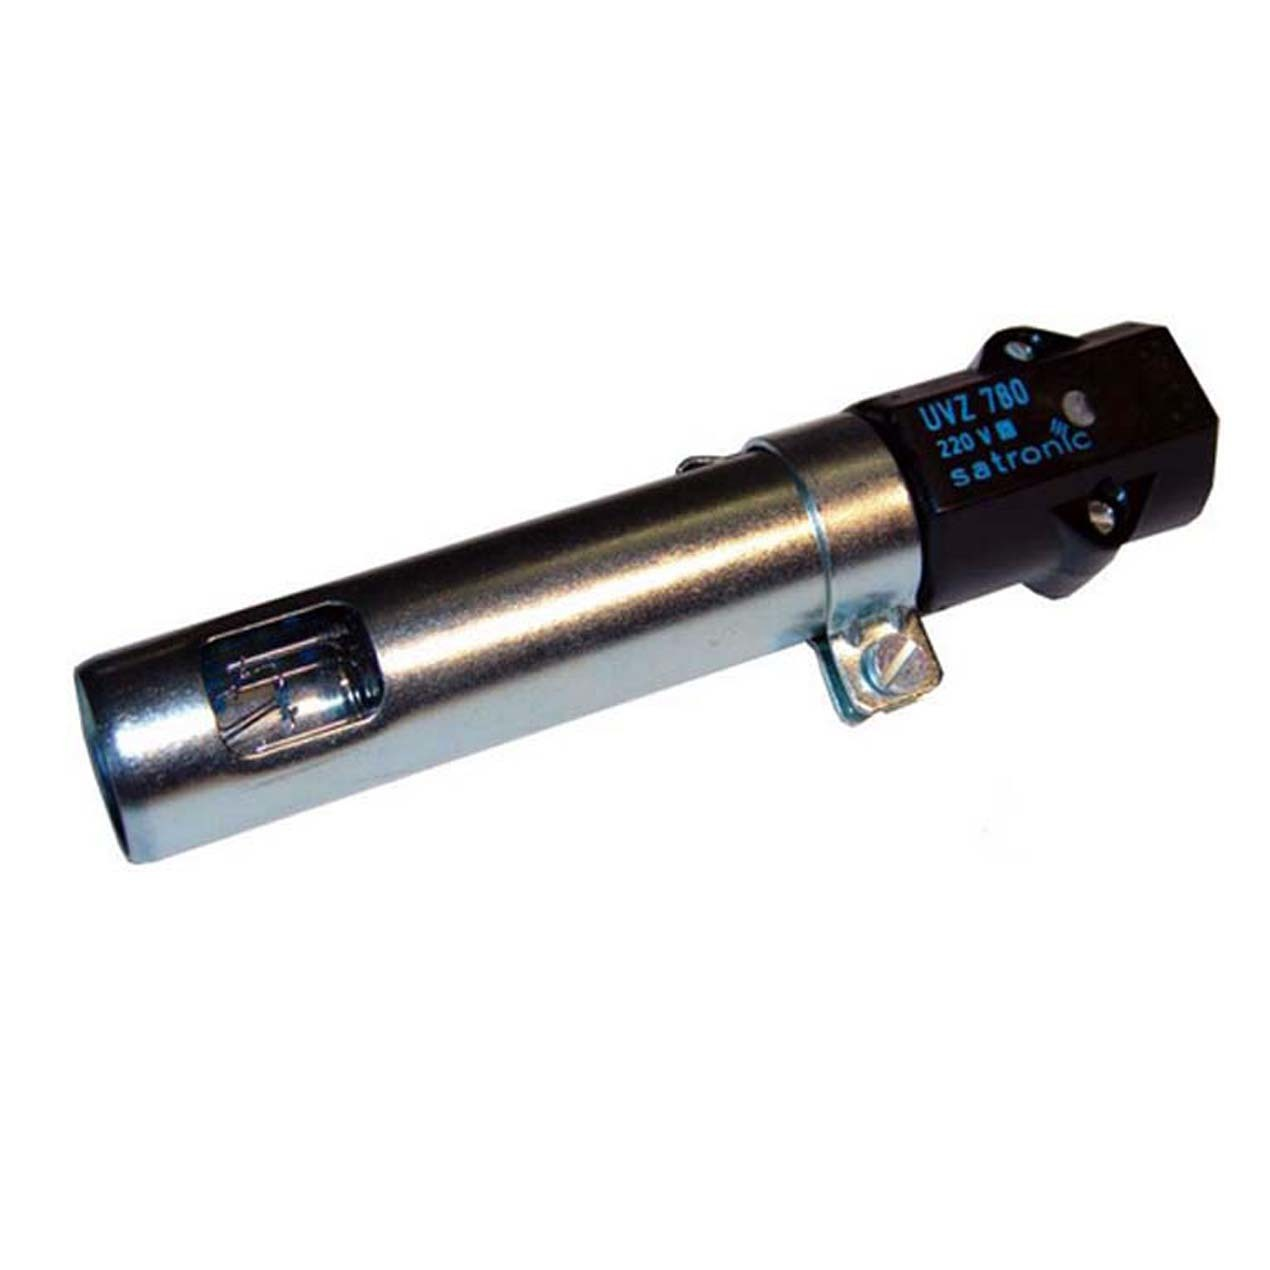 SATRONIC UVZ 780 UV Sensor